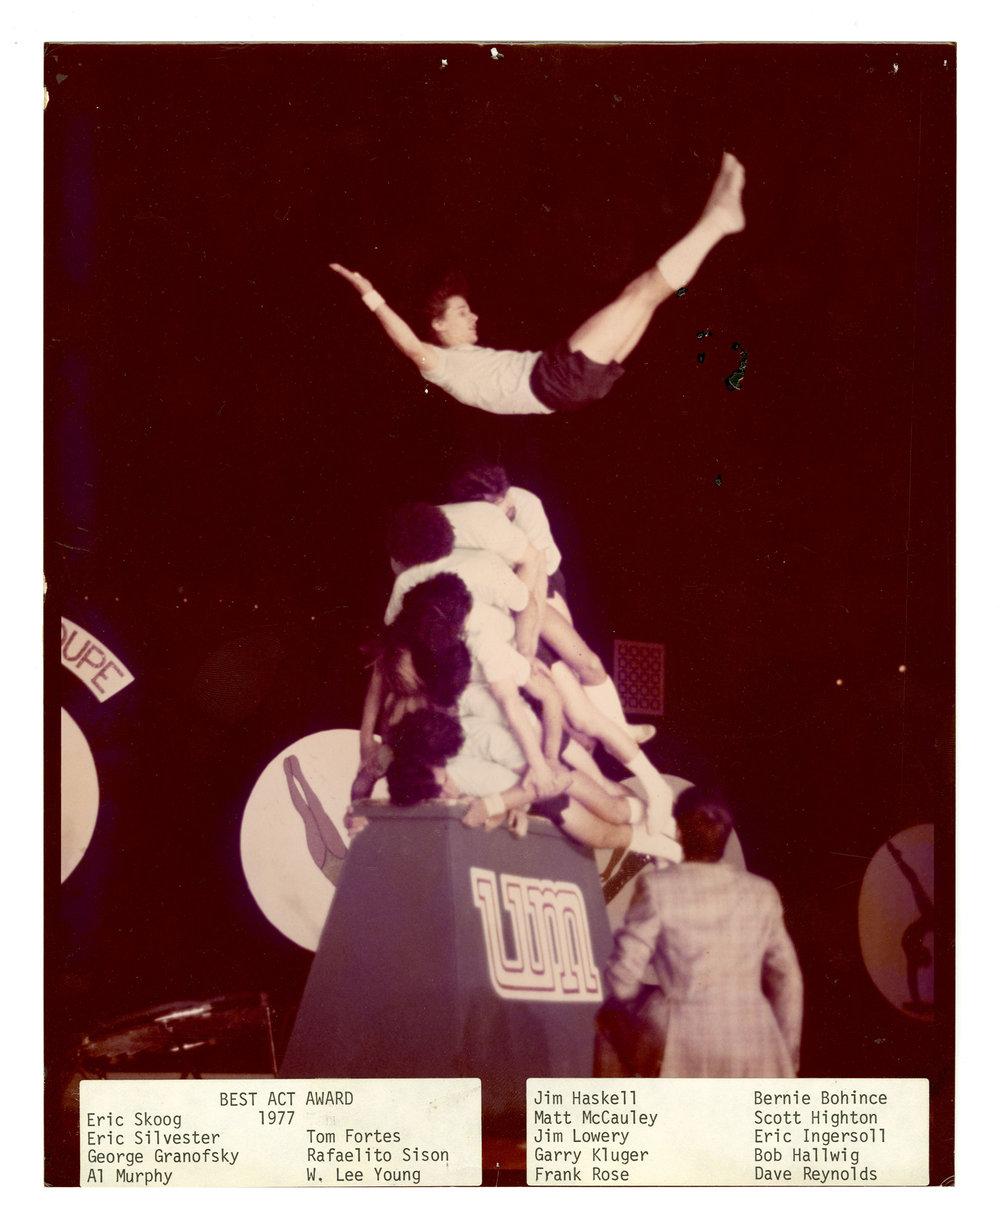 1977 - Vaulting